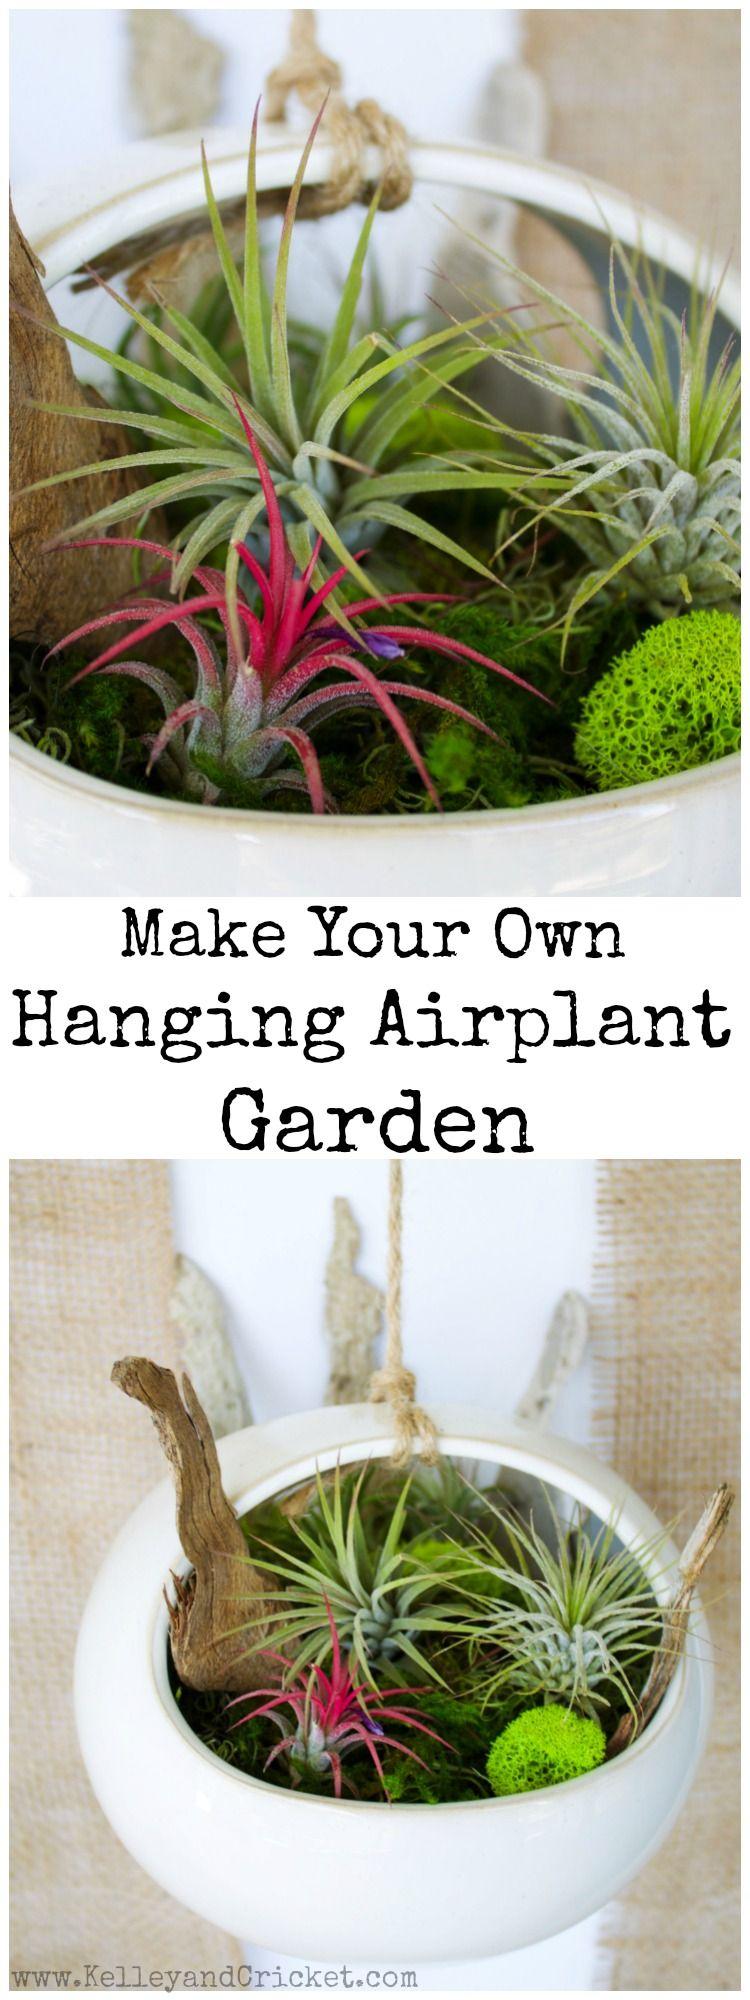 Hanging air plant garden mind body vision air